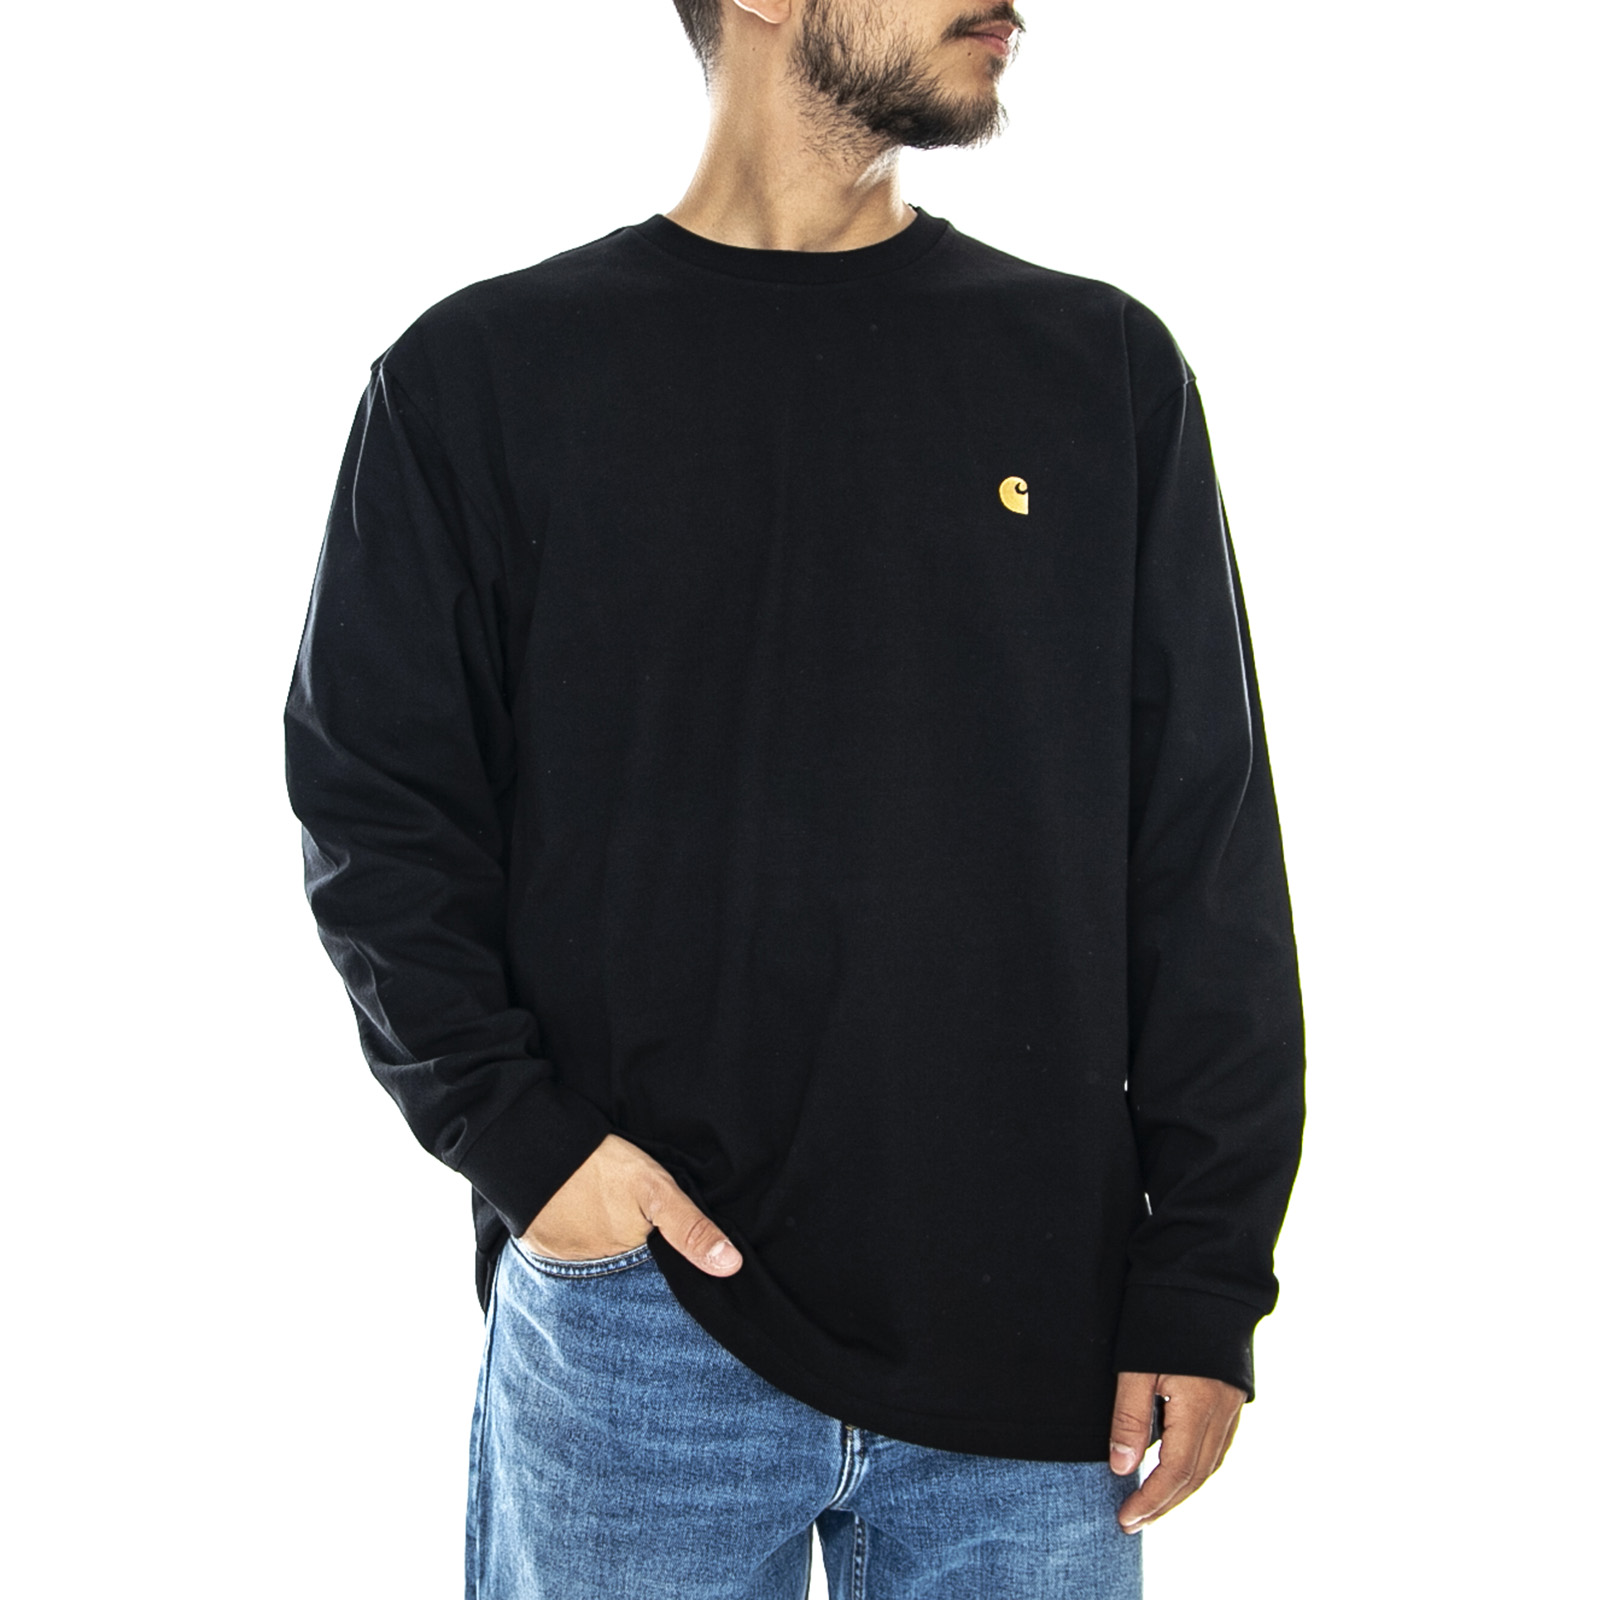 taille 40 948db fb747 Détails sur Carhartt Chase Ls Tee - Black / or - T-Shirt Manches Longues  Homme Noir